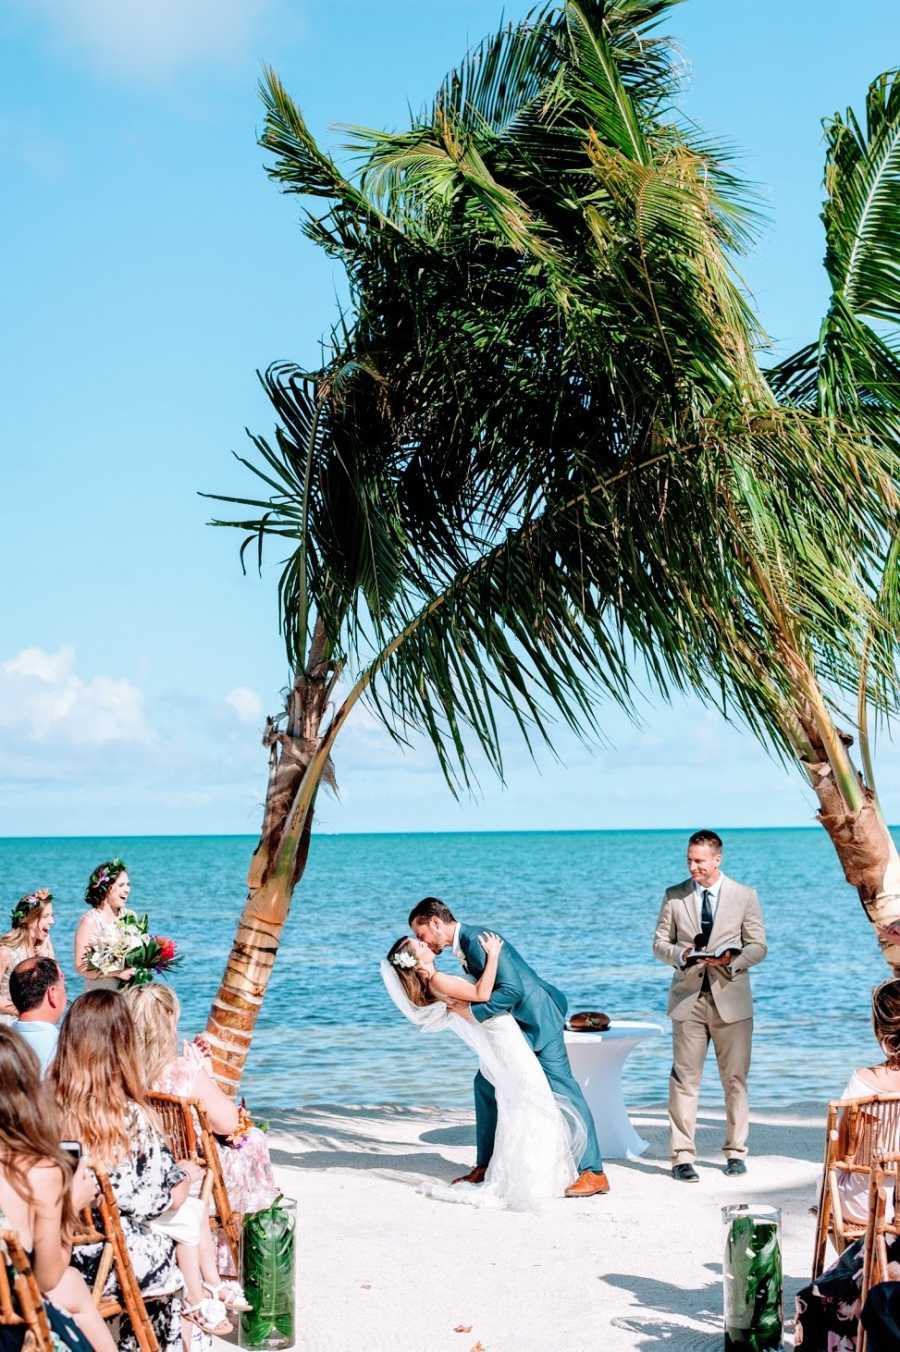 Groom dips chronically ill bride at wedding on beach